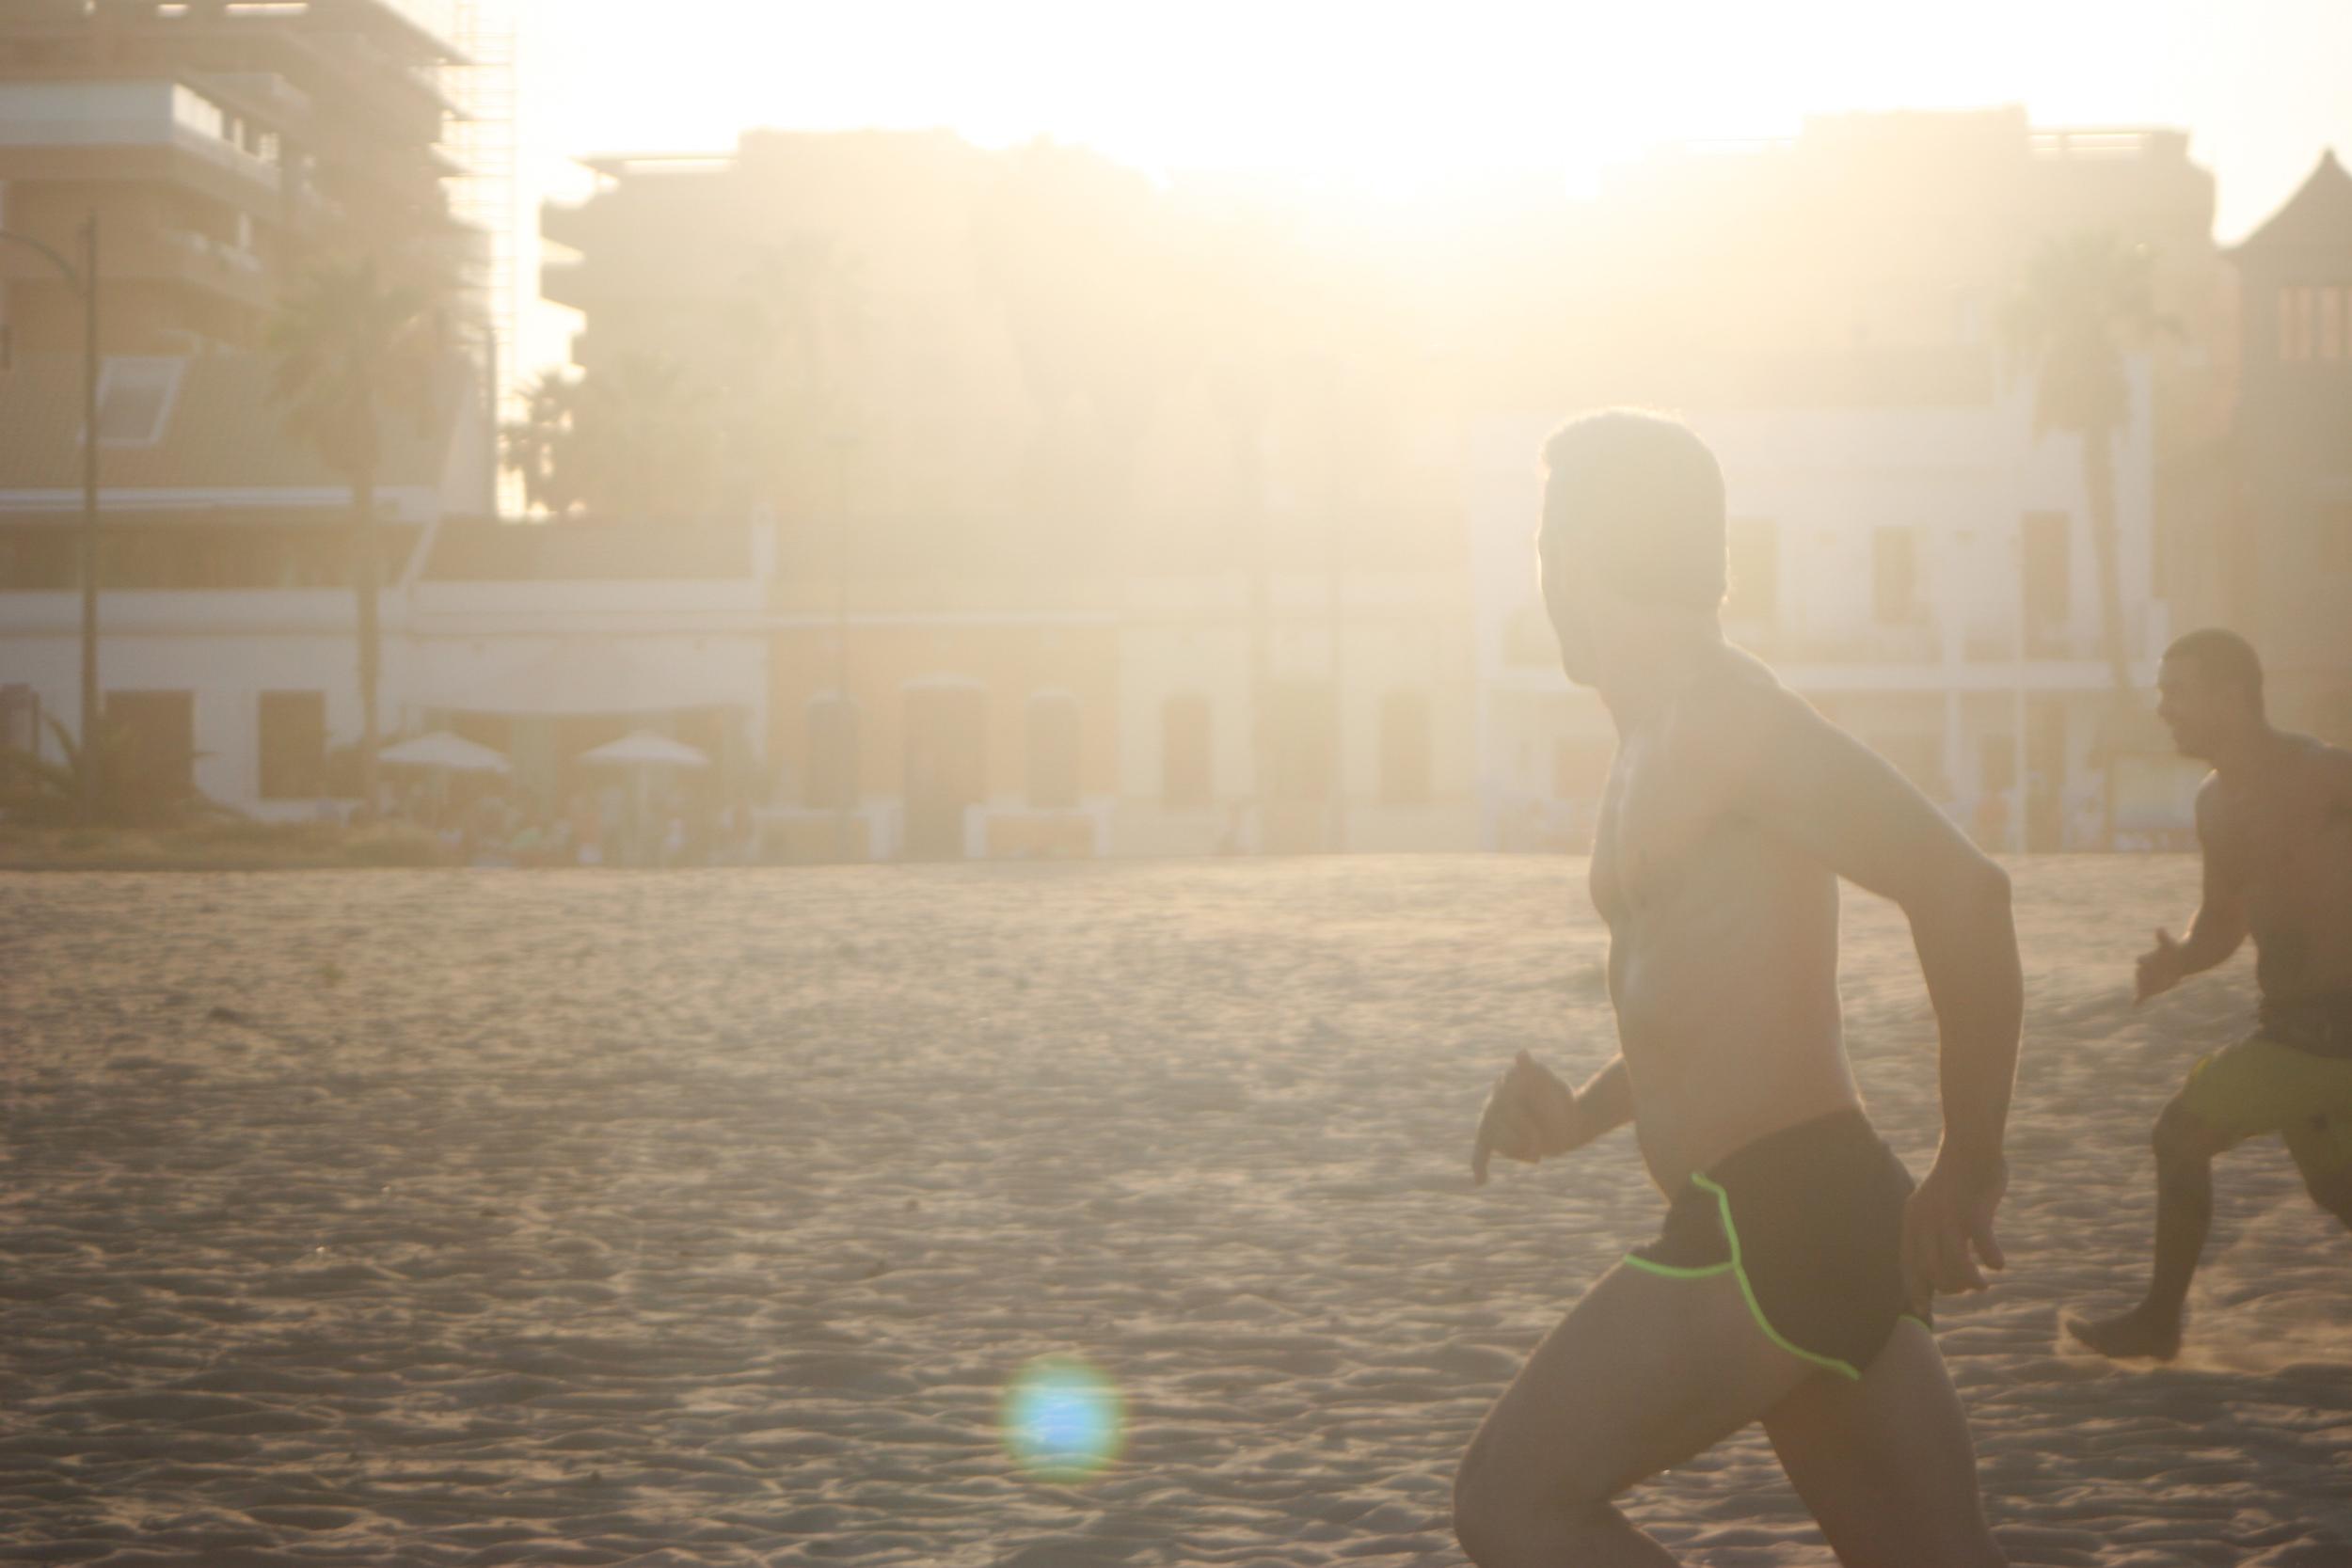 Full_CrossFit_Beach_Wod_V2_2015-24.jpg